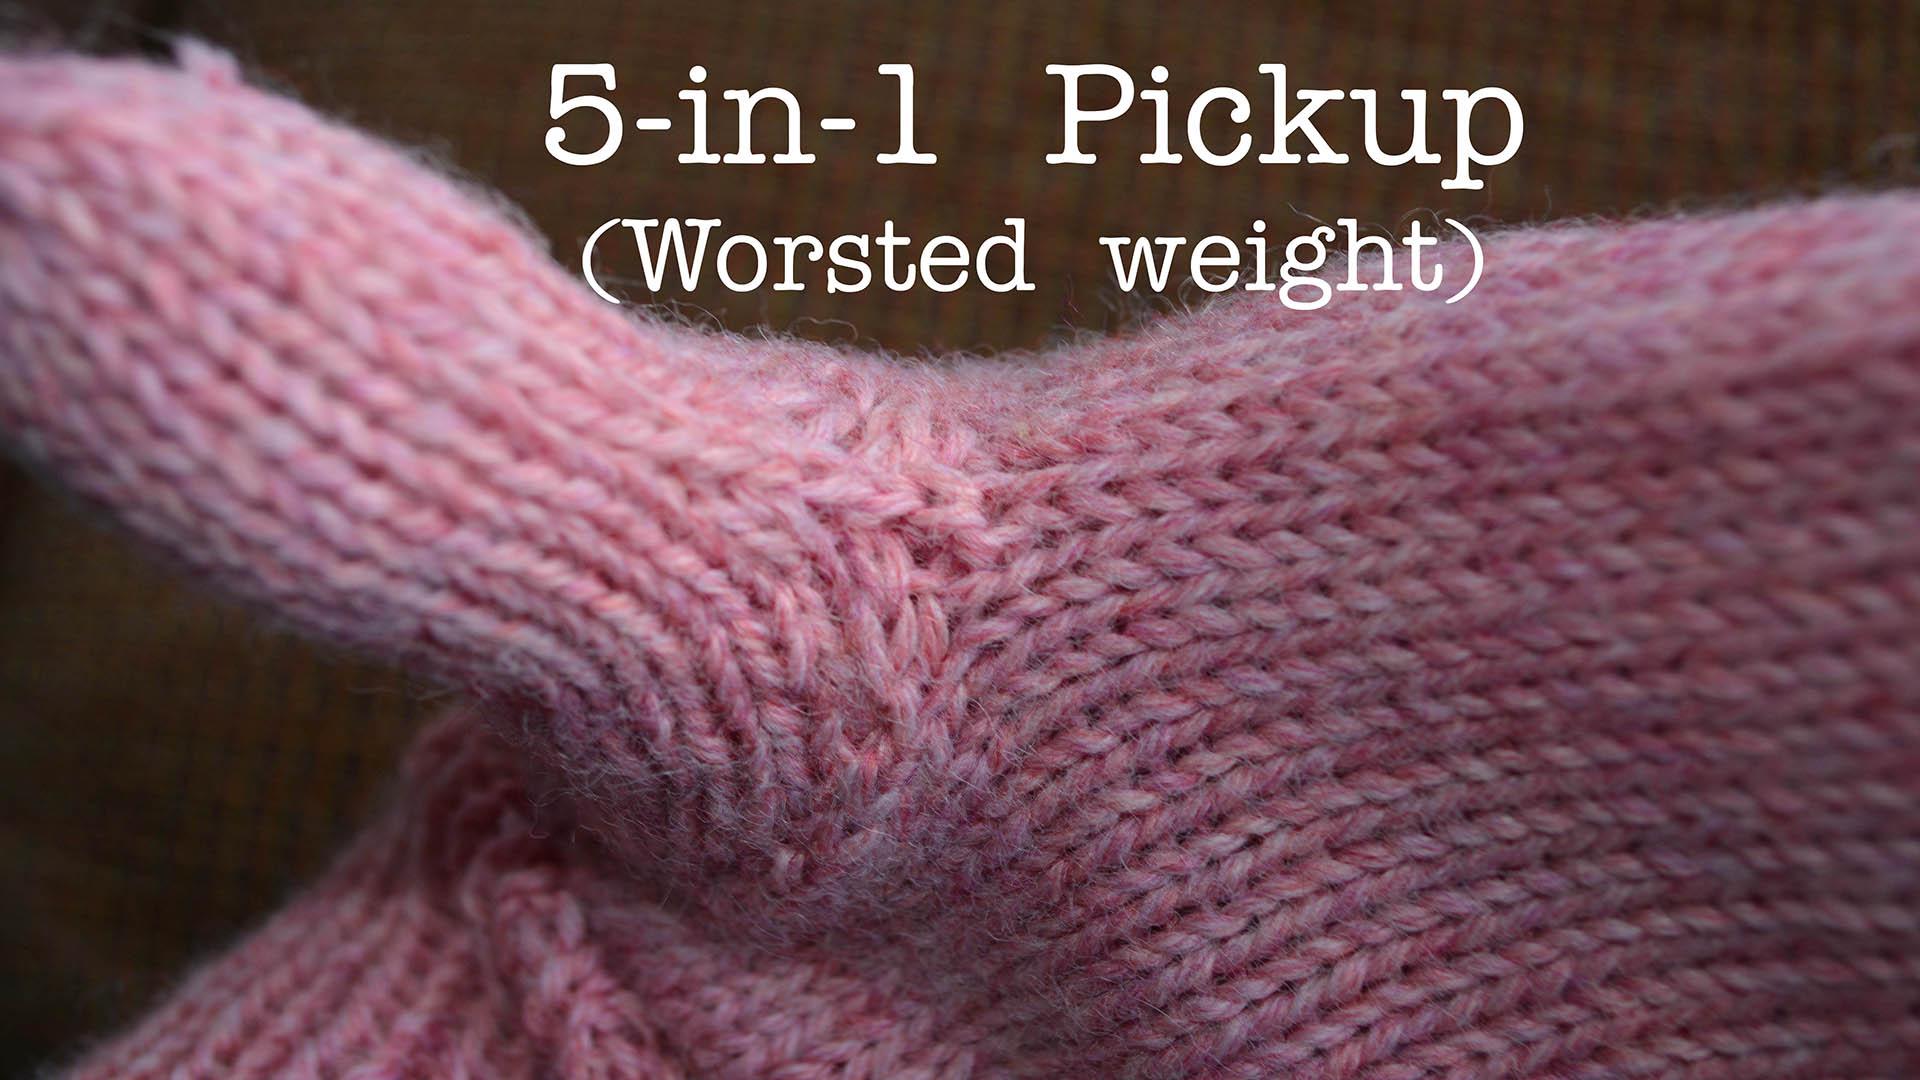 Wrsted wght 5-in-1.jpg